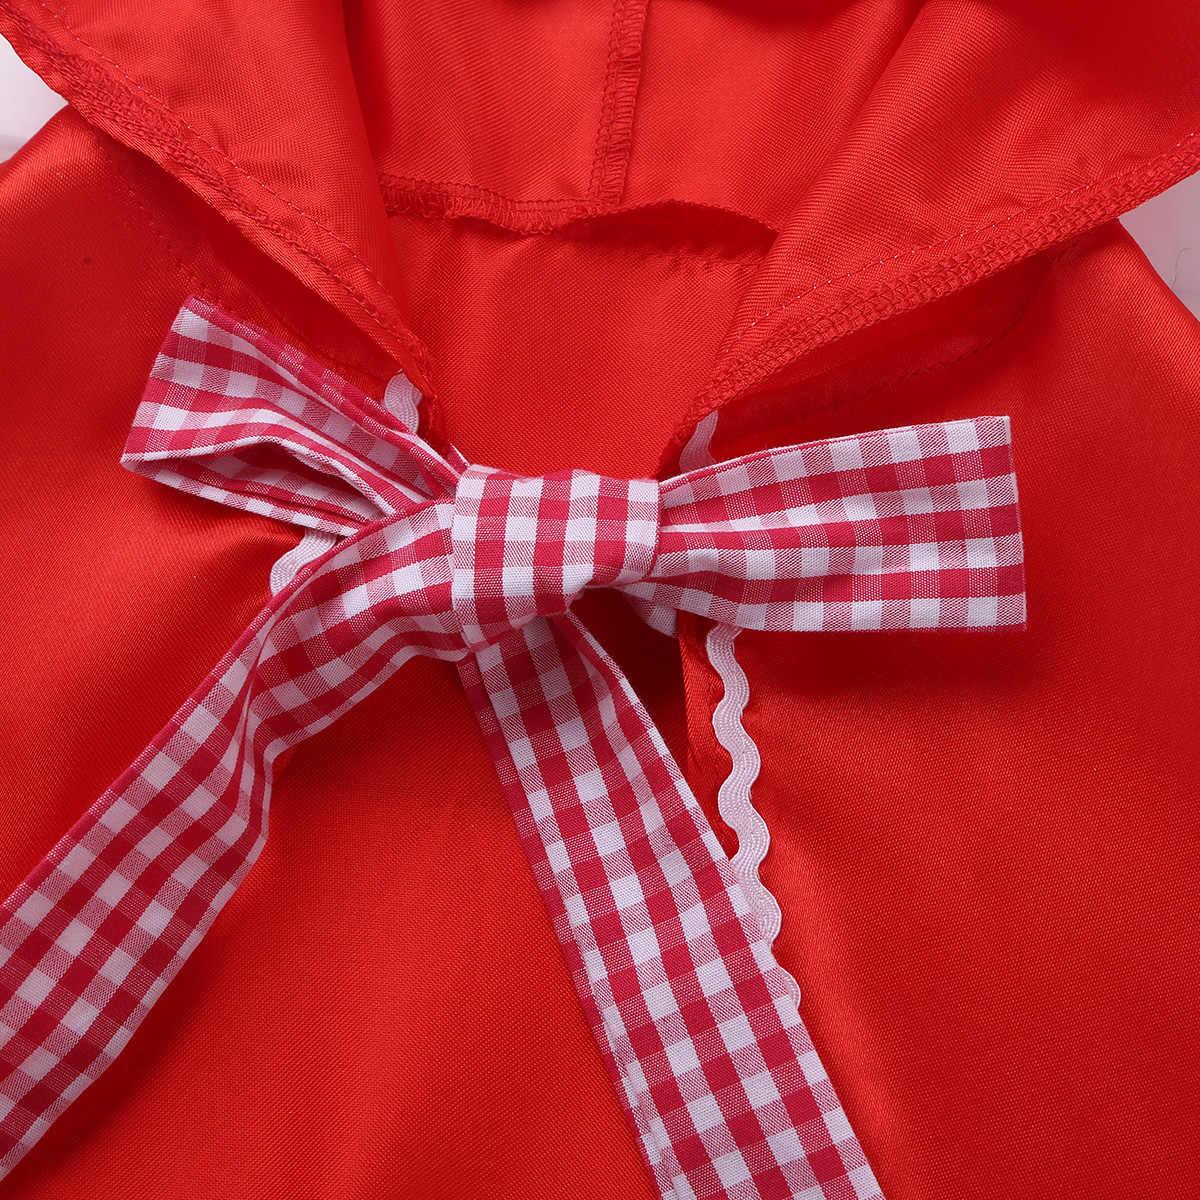 Little Red Riding Hood Kostum Cape Berdandan Halloween Jubah Cosplay Putri Jubah Coar untuk Balita Anak-anak Kecil Gadis Remaja